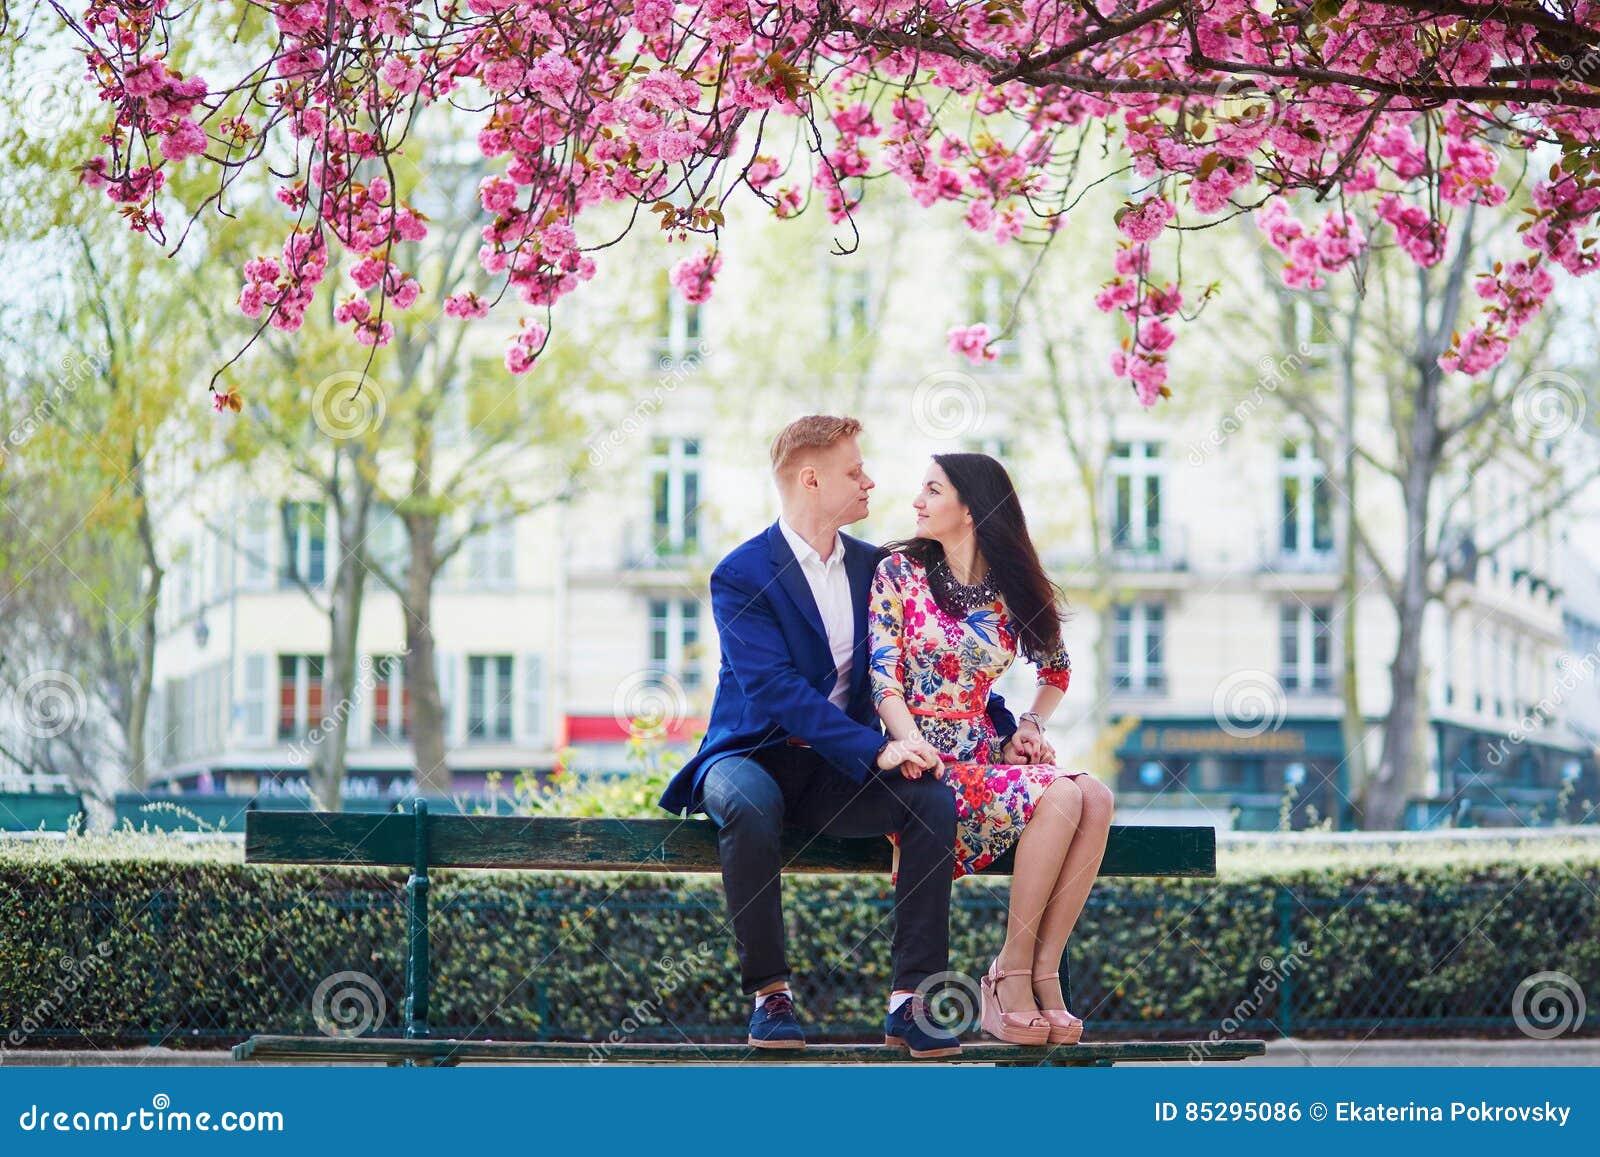 marokkanske amerikanske dating site